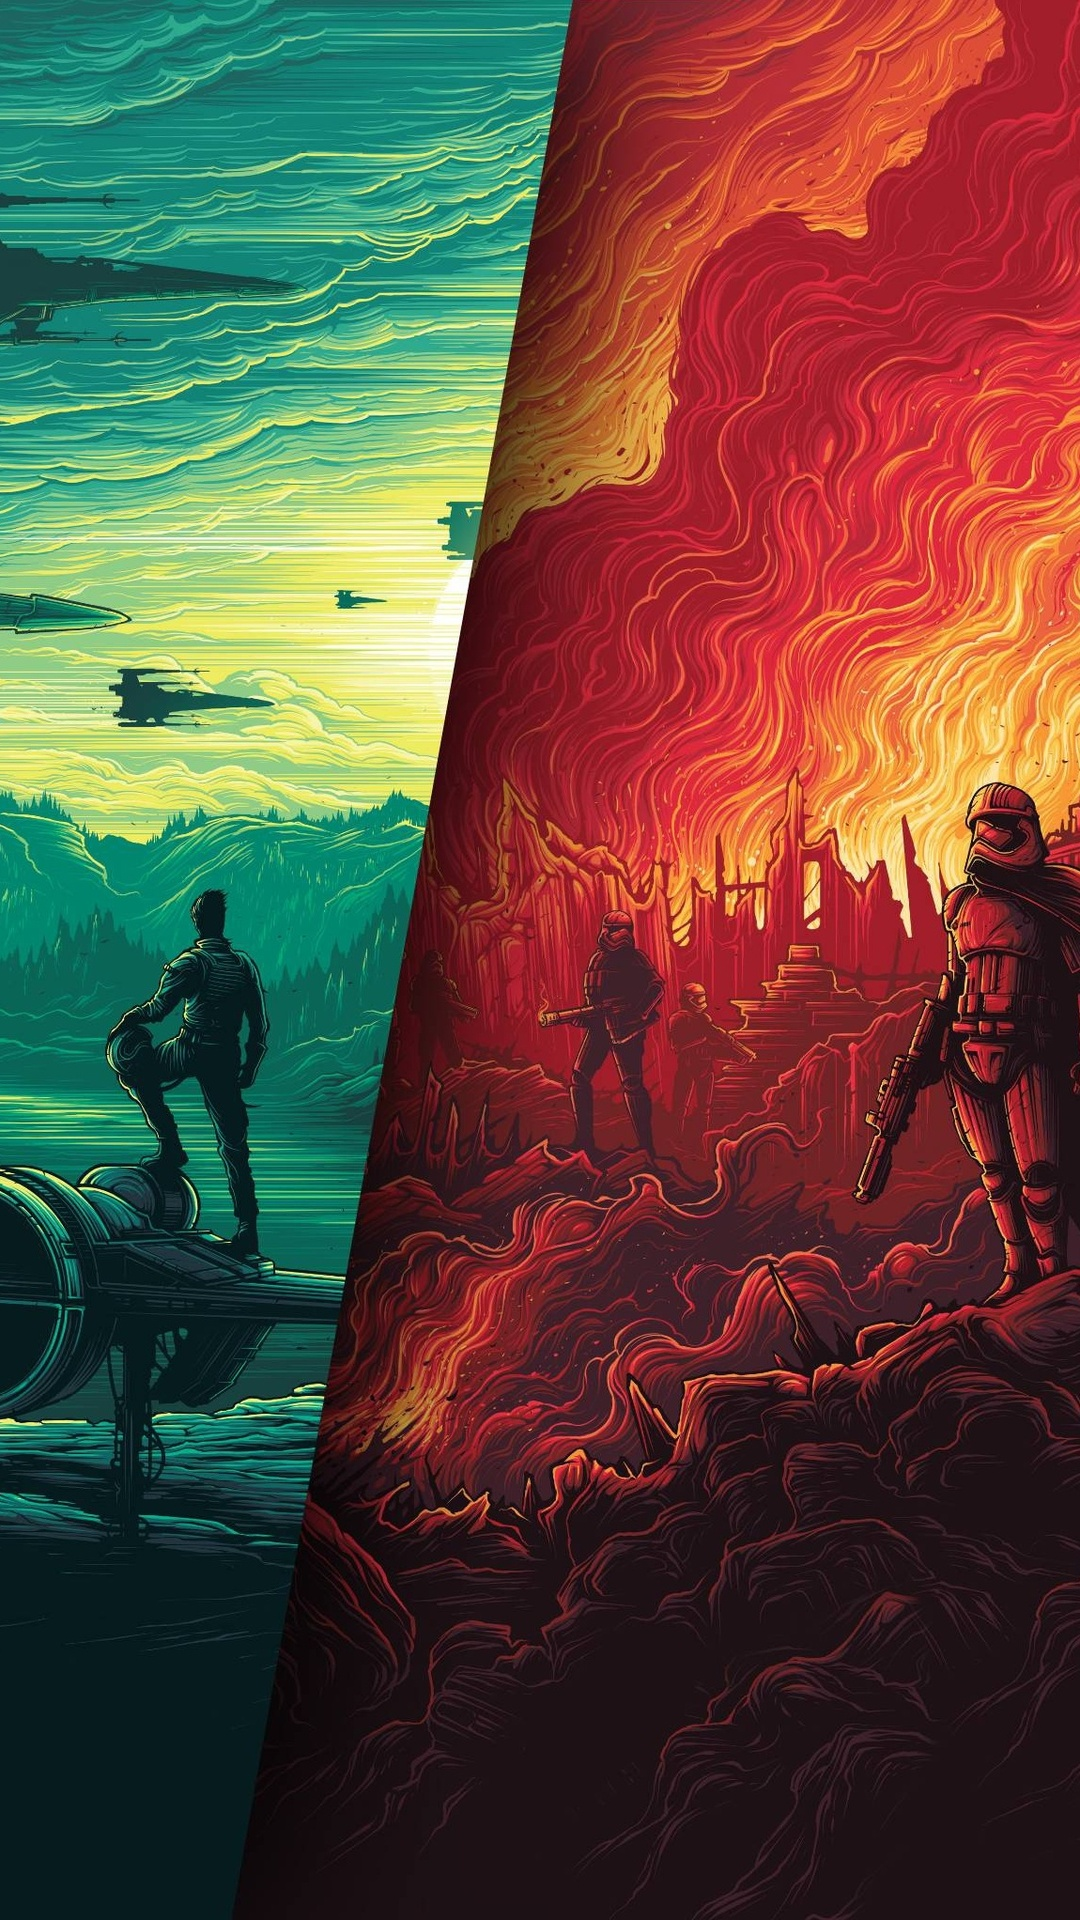 1080x1920 Star Wars Poster 4k Iphone 7,6s,6 Plus, Pixel xl ...